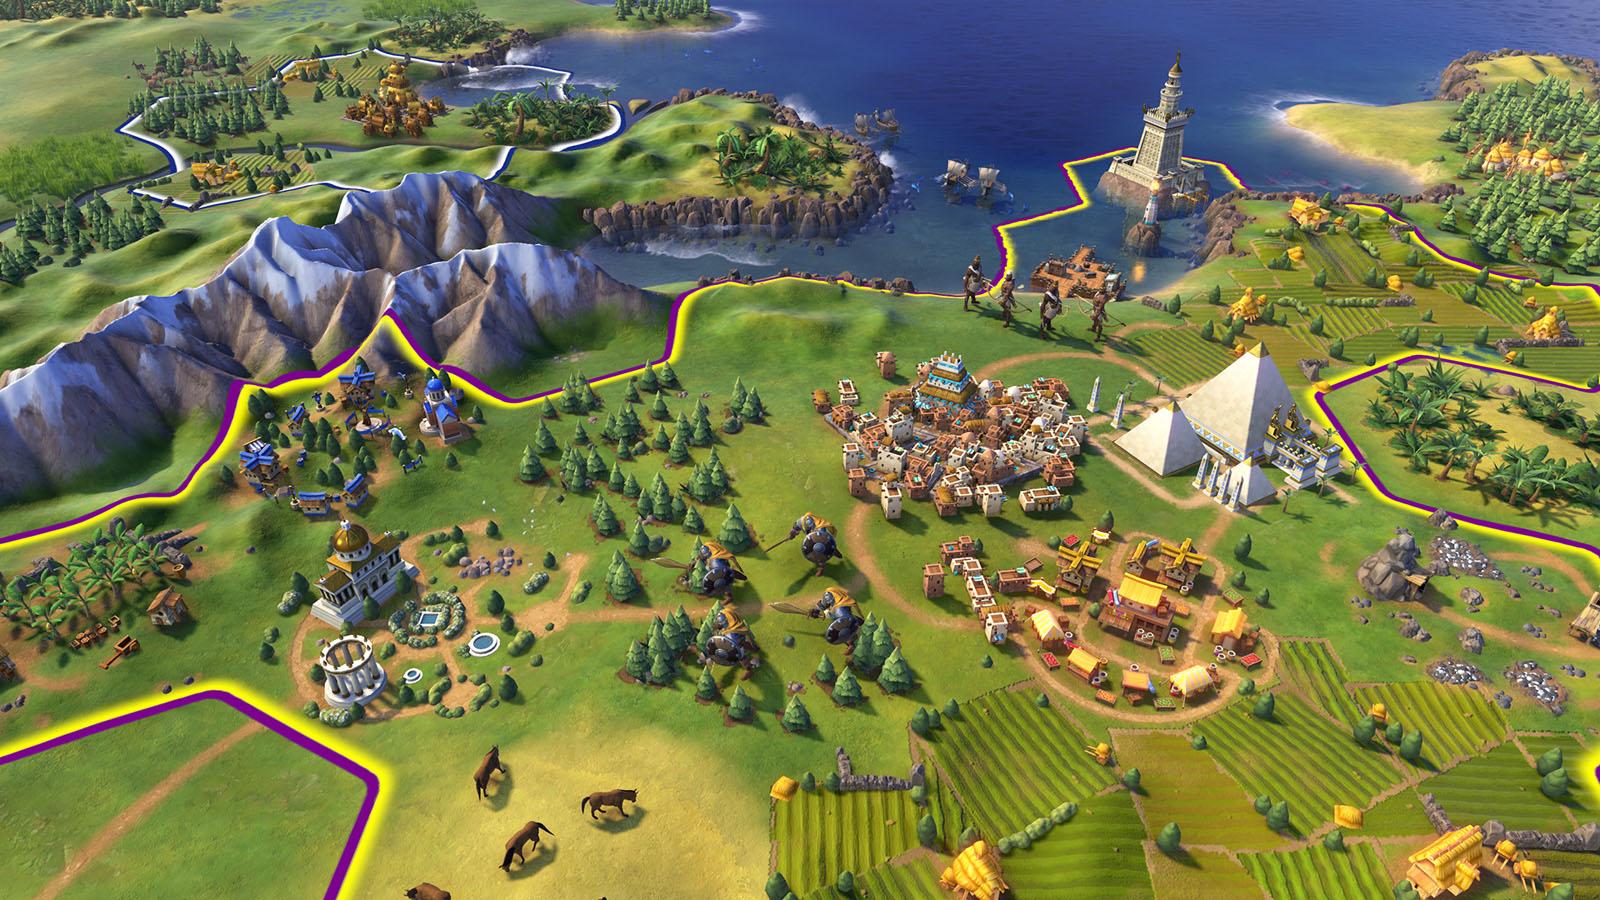 Скриншот Sid Meier's Civilization VI: Digital Deluxe (2016) PC